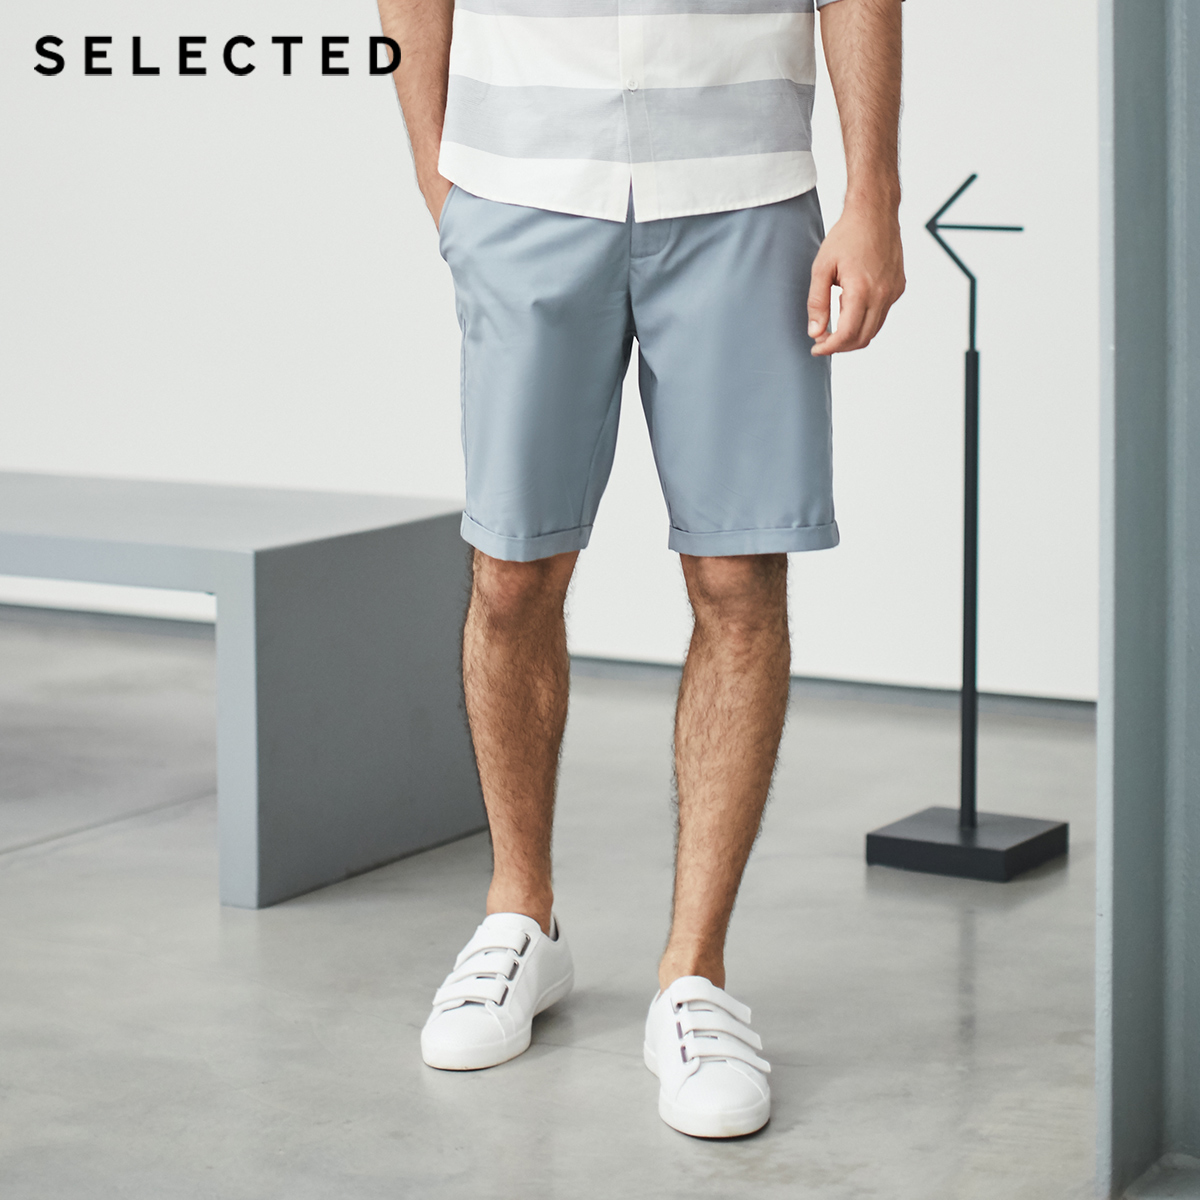 SELECTED Tencel Fabric Blend Straight-leg Leisure  Mens Shorts S|4182SH516